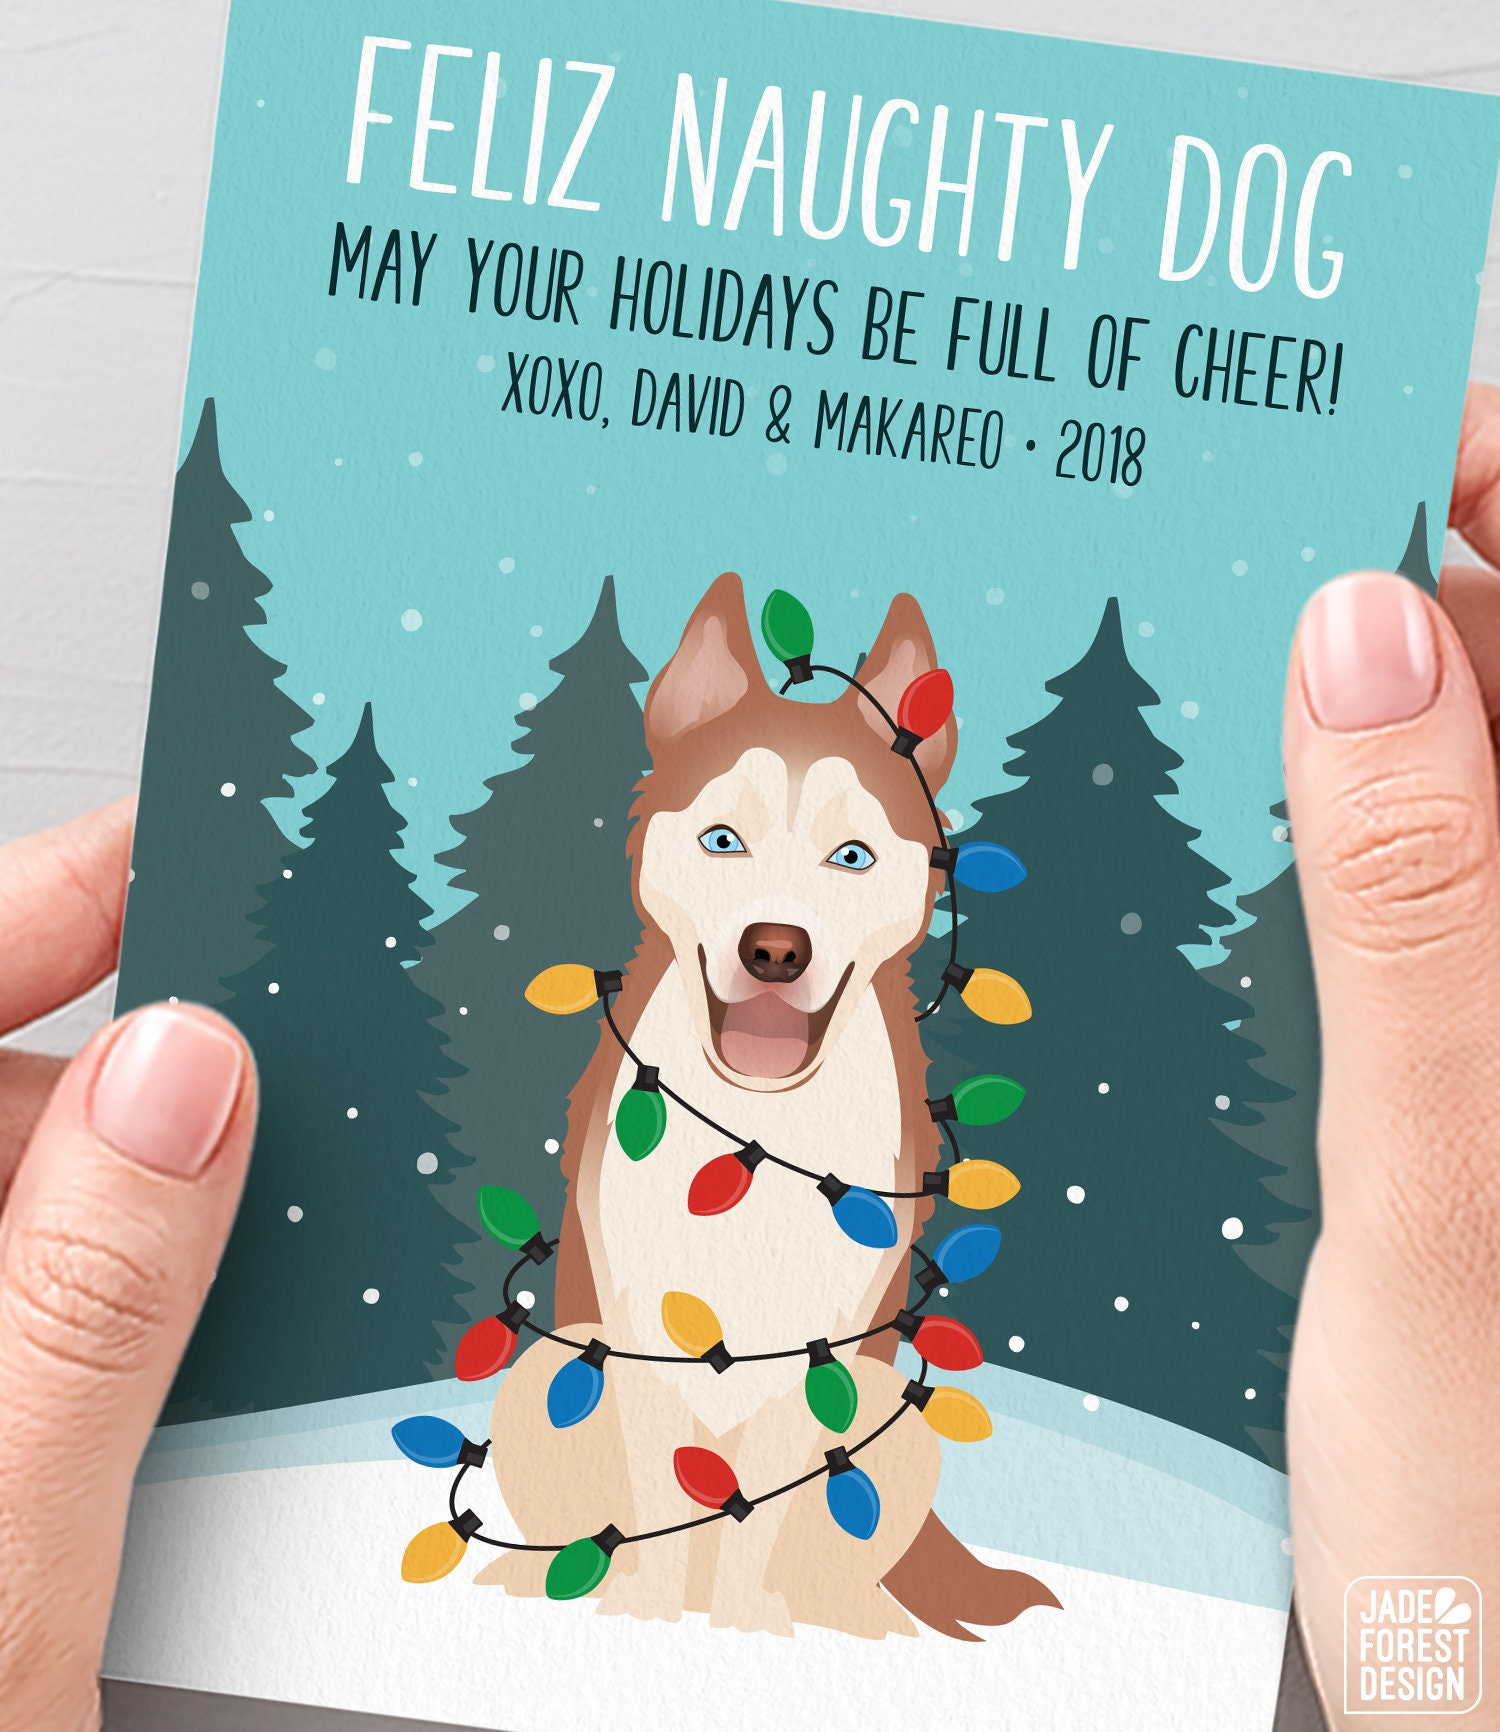 Husky Christmas Cards.Copper Husky Christmas Card Unique Holiday Cards With